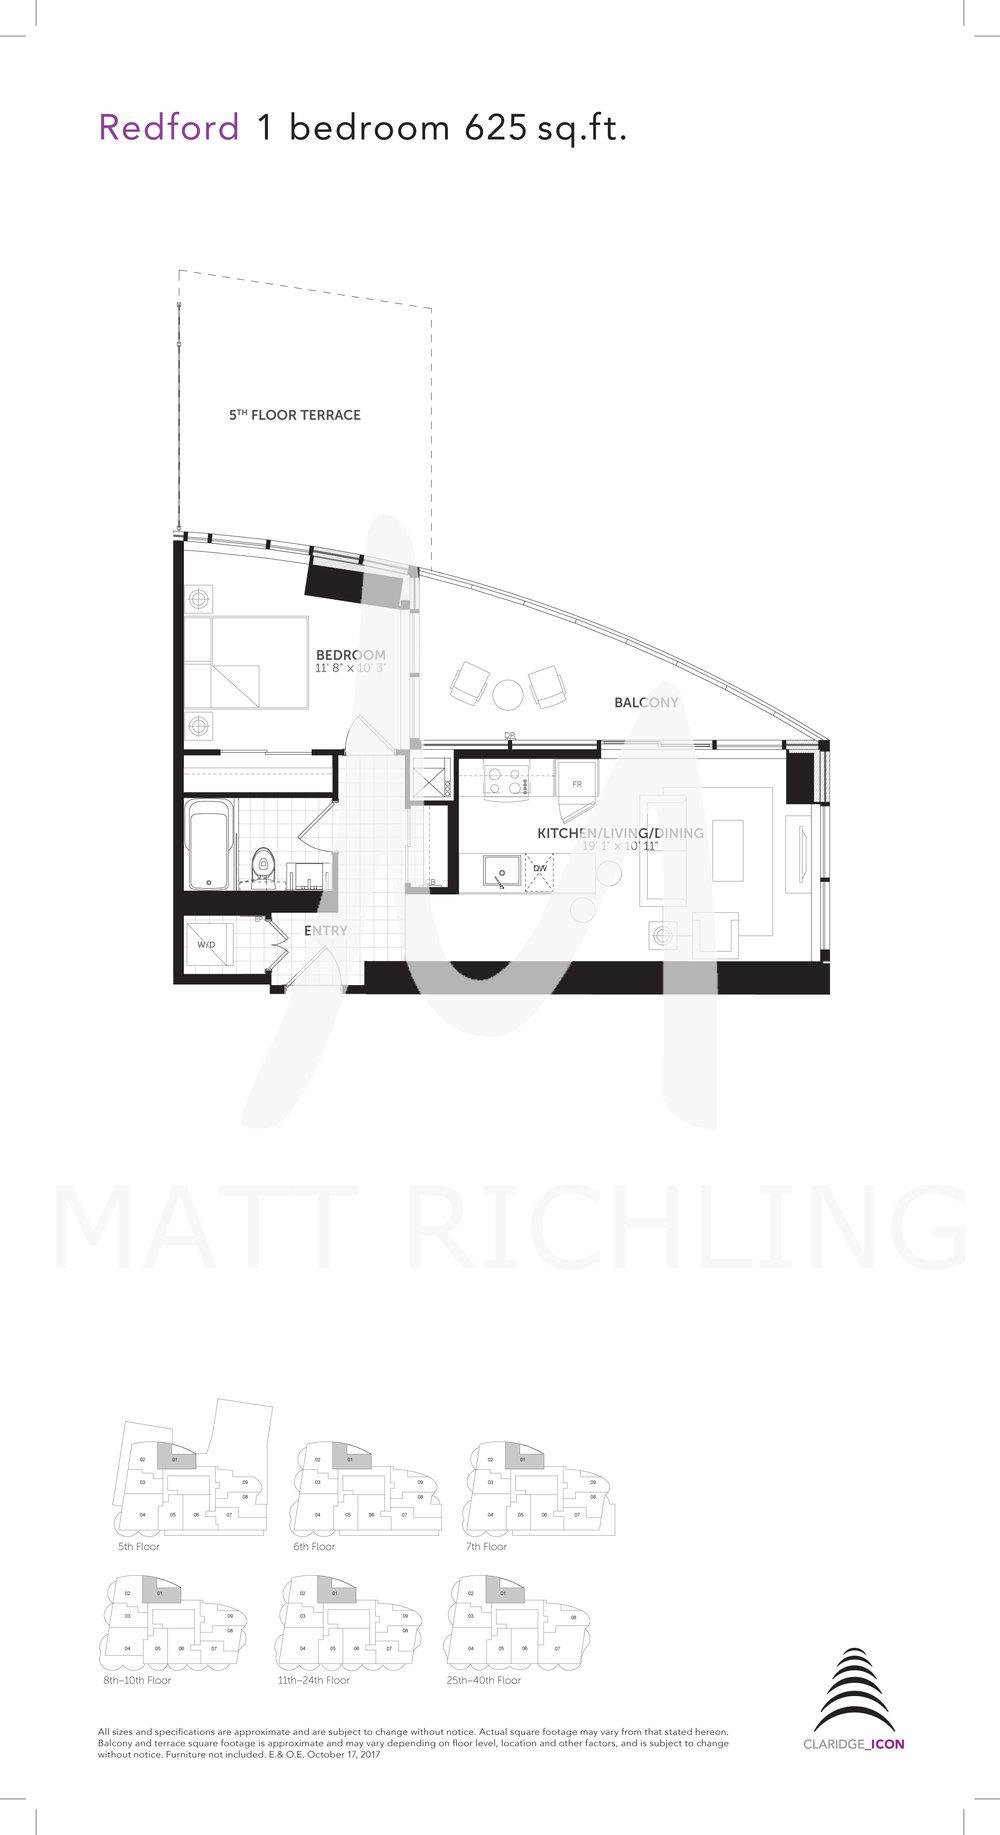 Redford---1-Bed.jpg